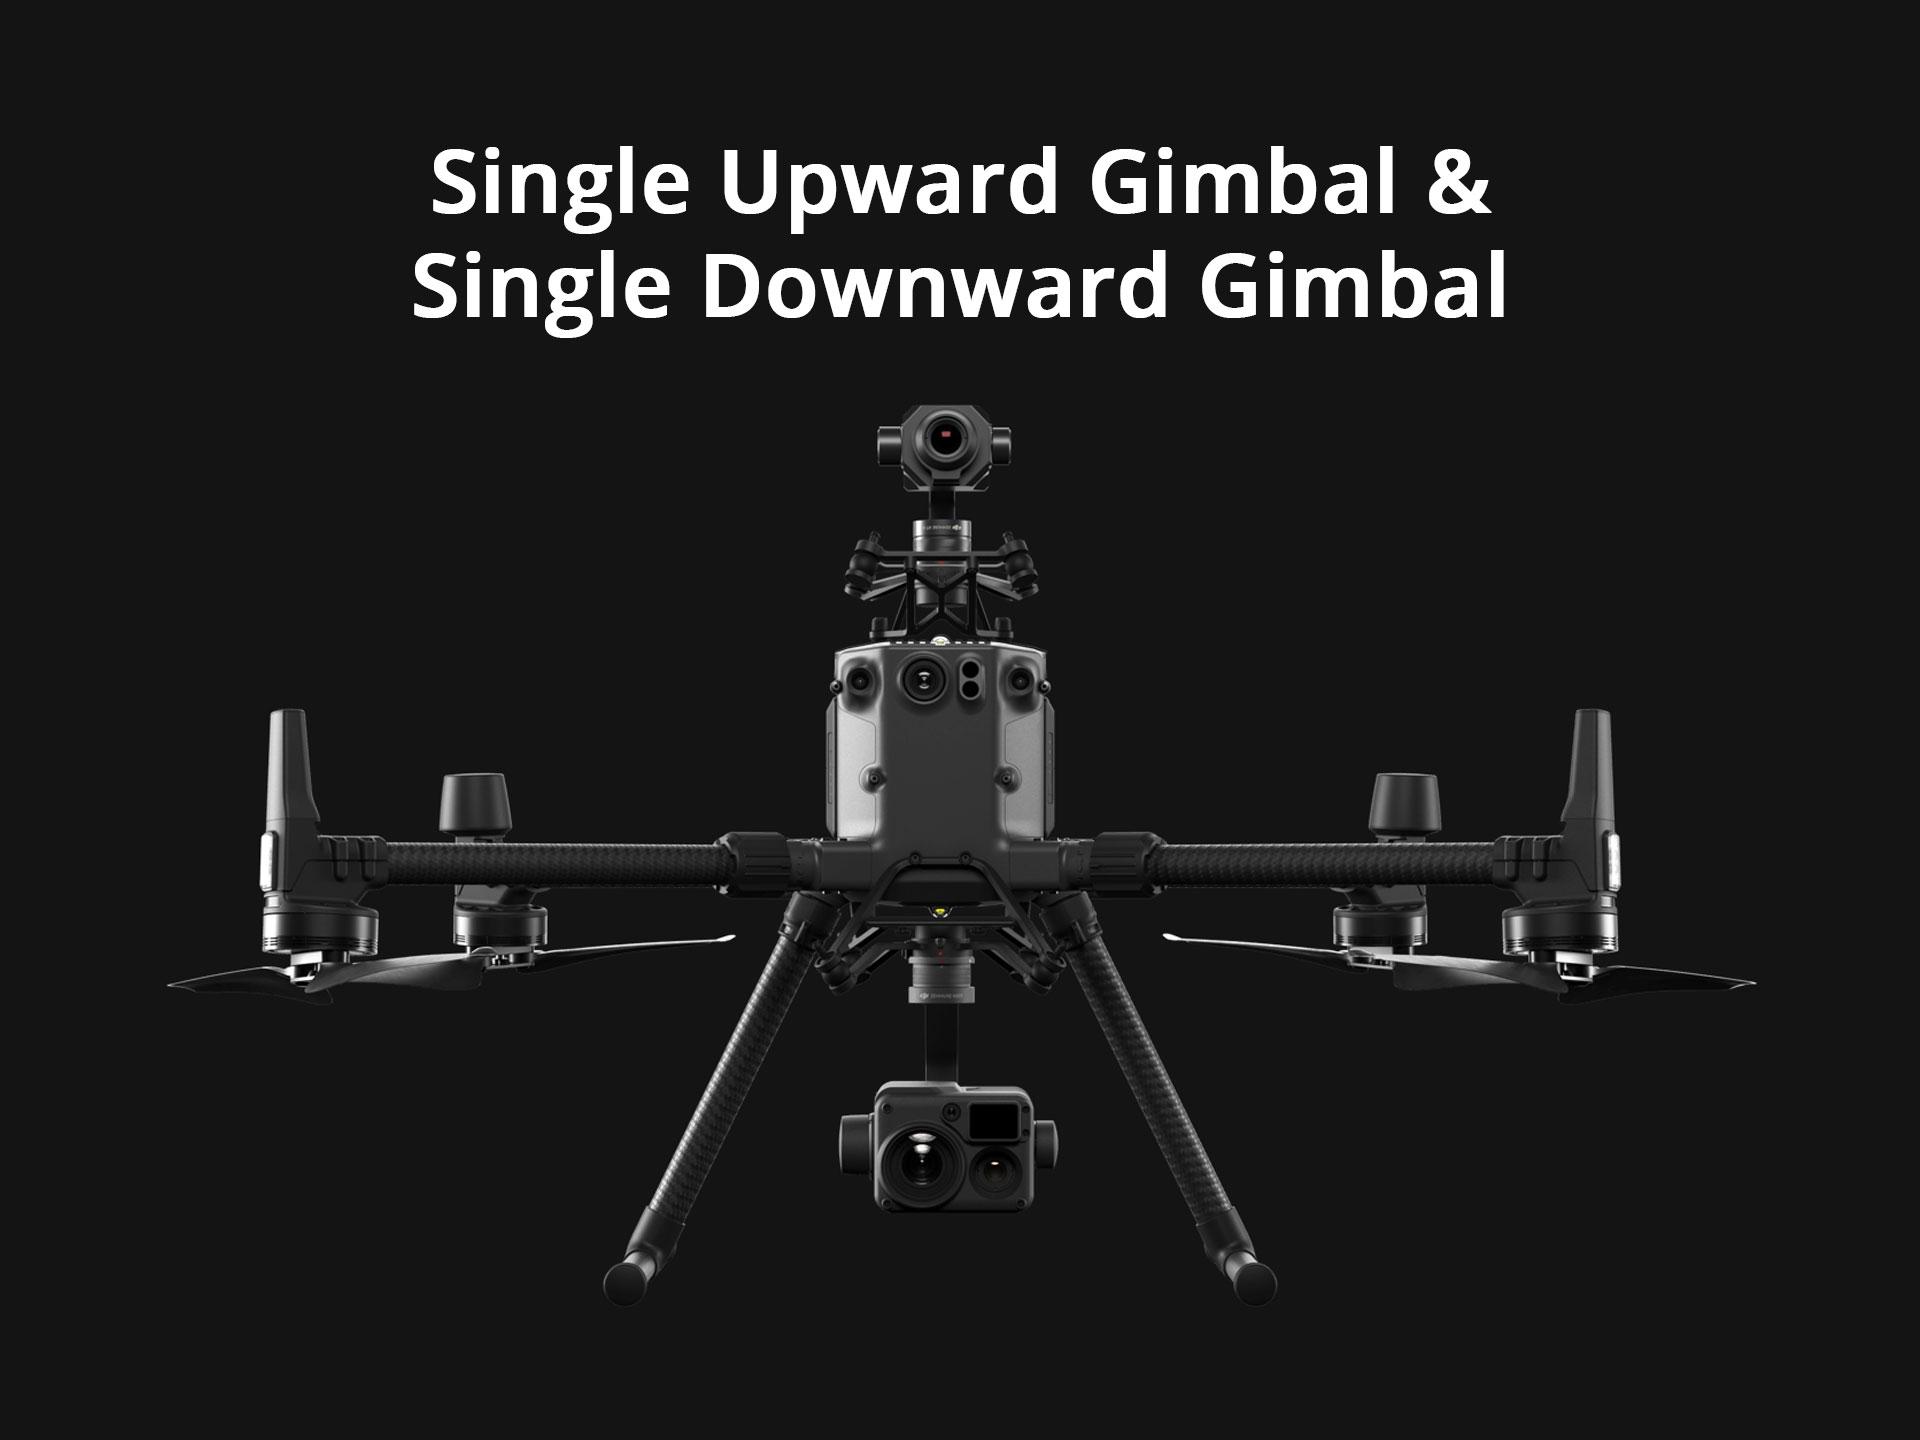 DJI Matrice 300 RTK Single Upward Gimbal x Single Downward Gimbal